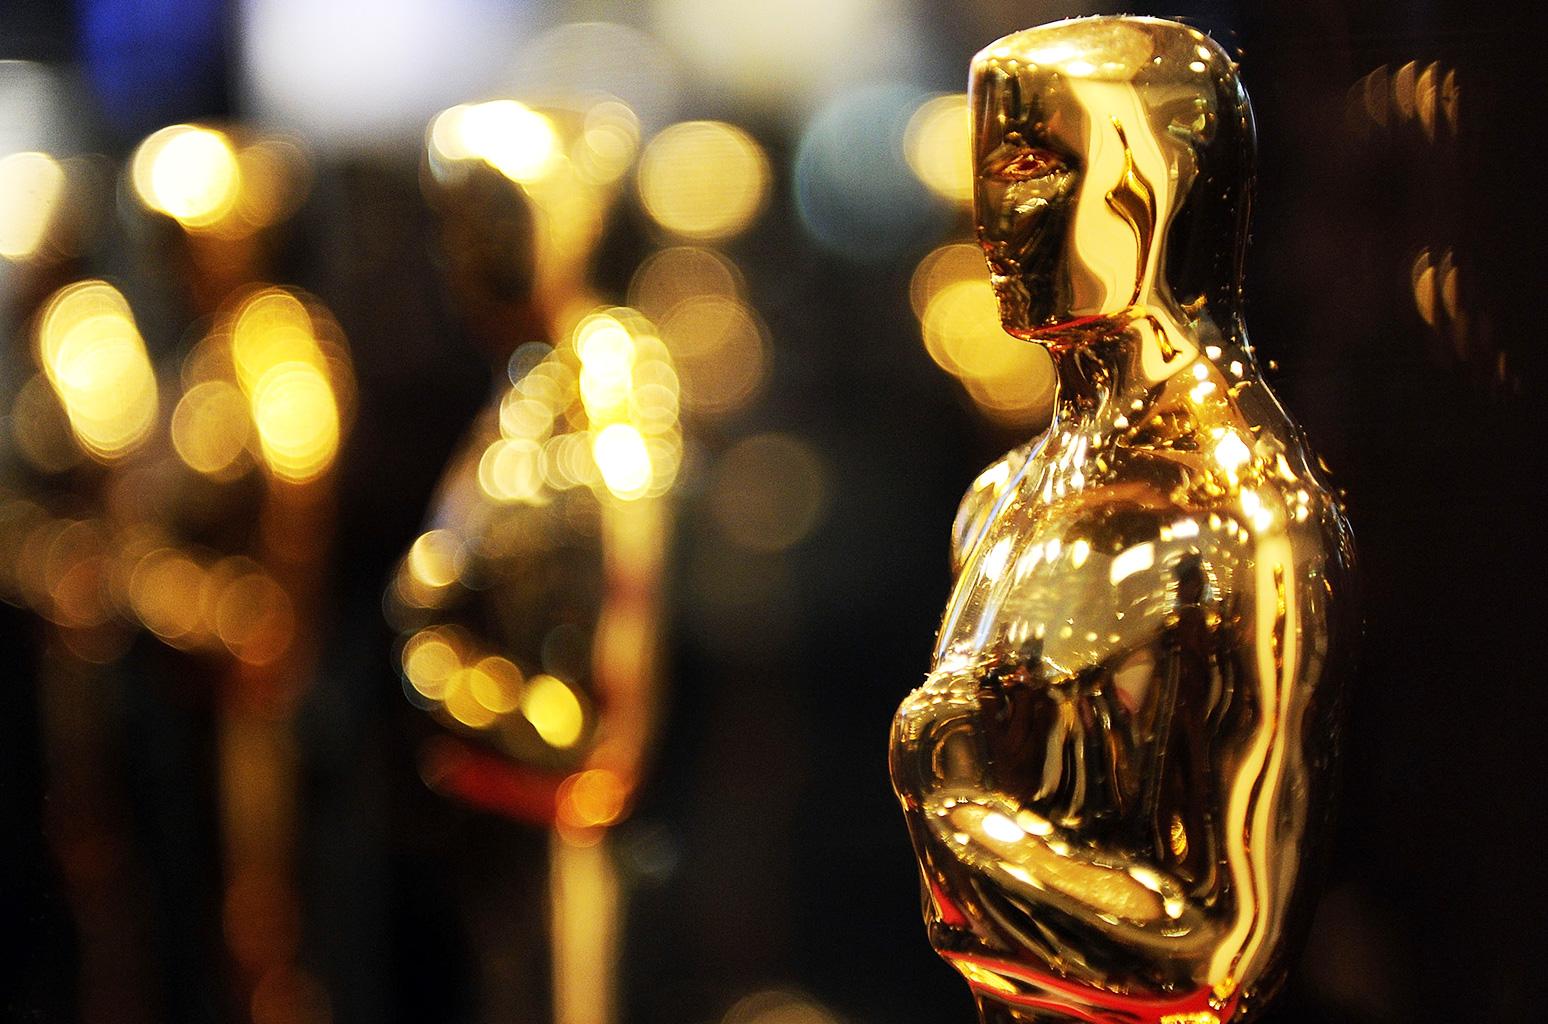 Oscar Nominations 2019 Full List – Nominees for Academy Awards